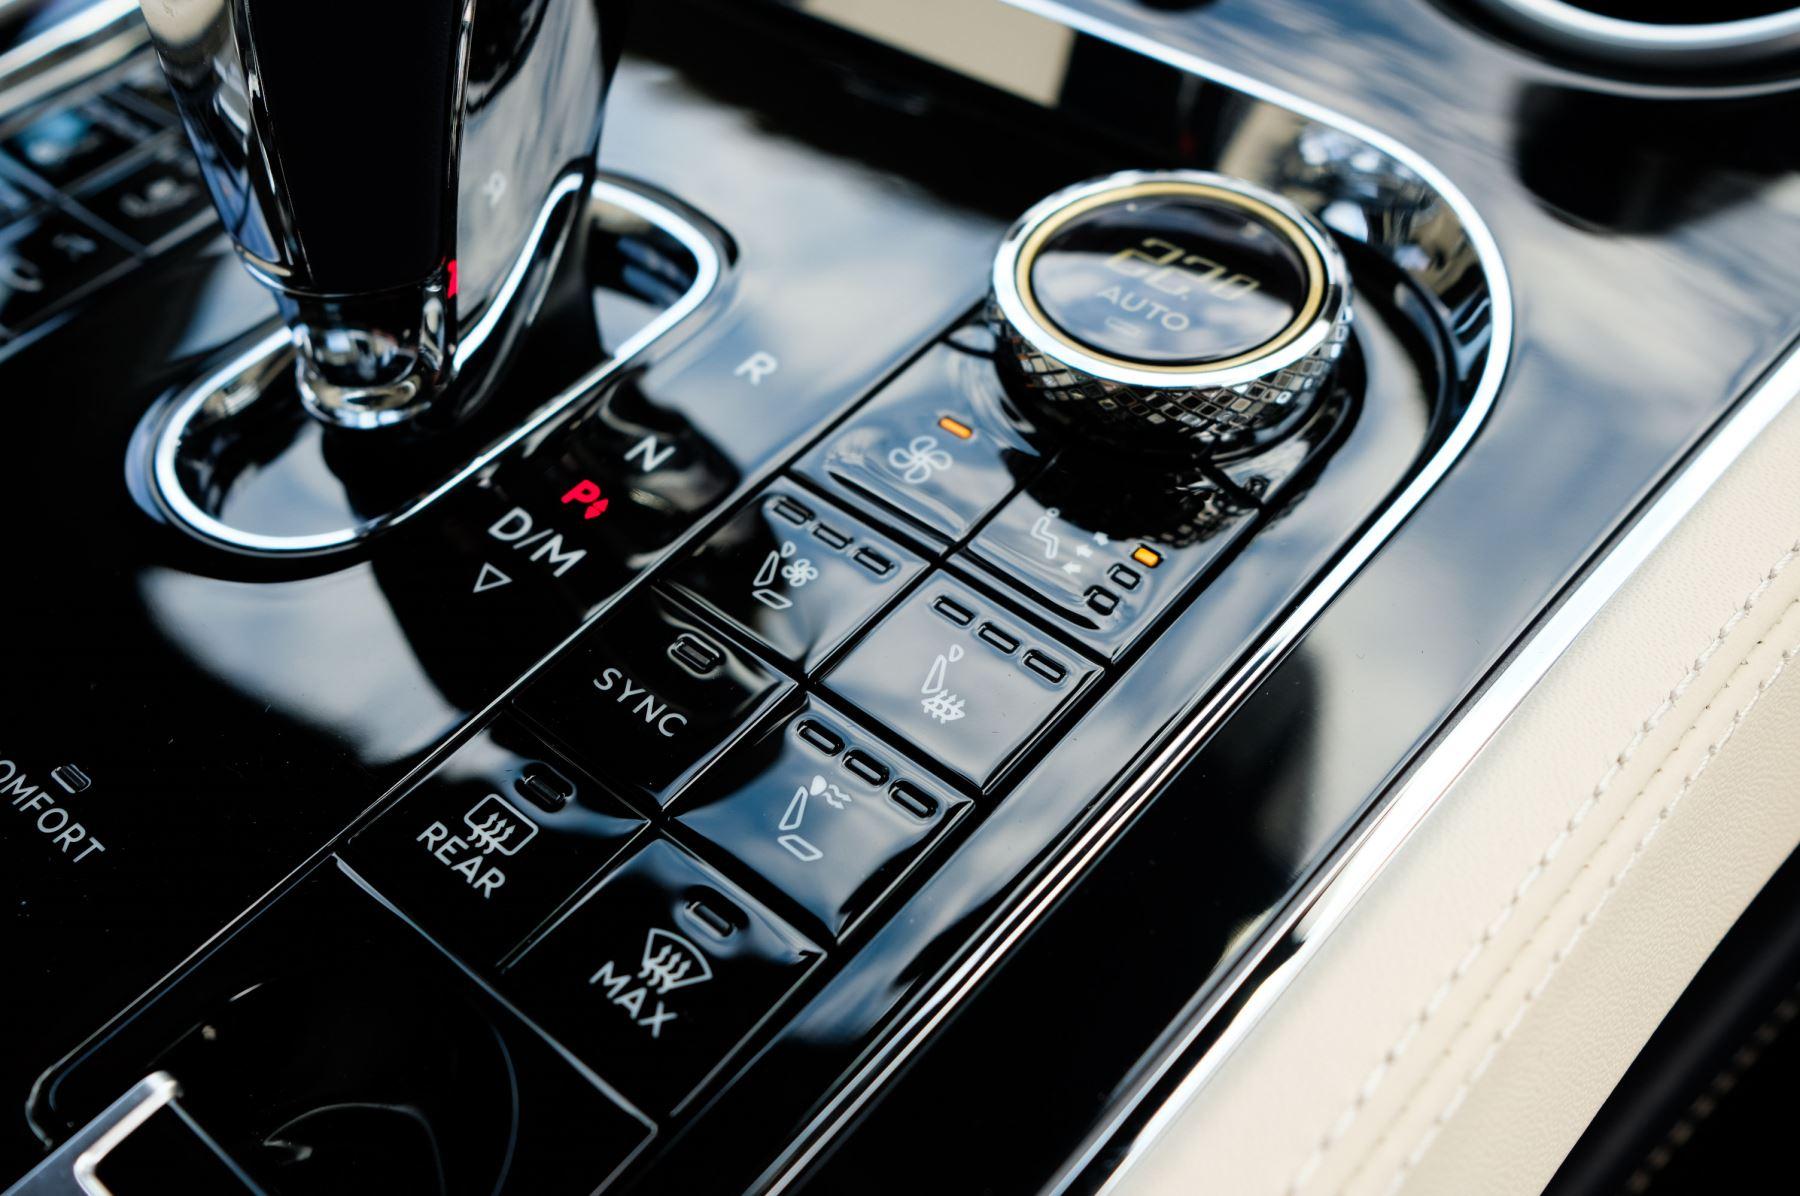 Bentley Continental GTC 4.0 V8 Mulliner Edition 2dr Auto [Tour Spec] image 21